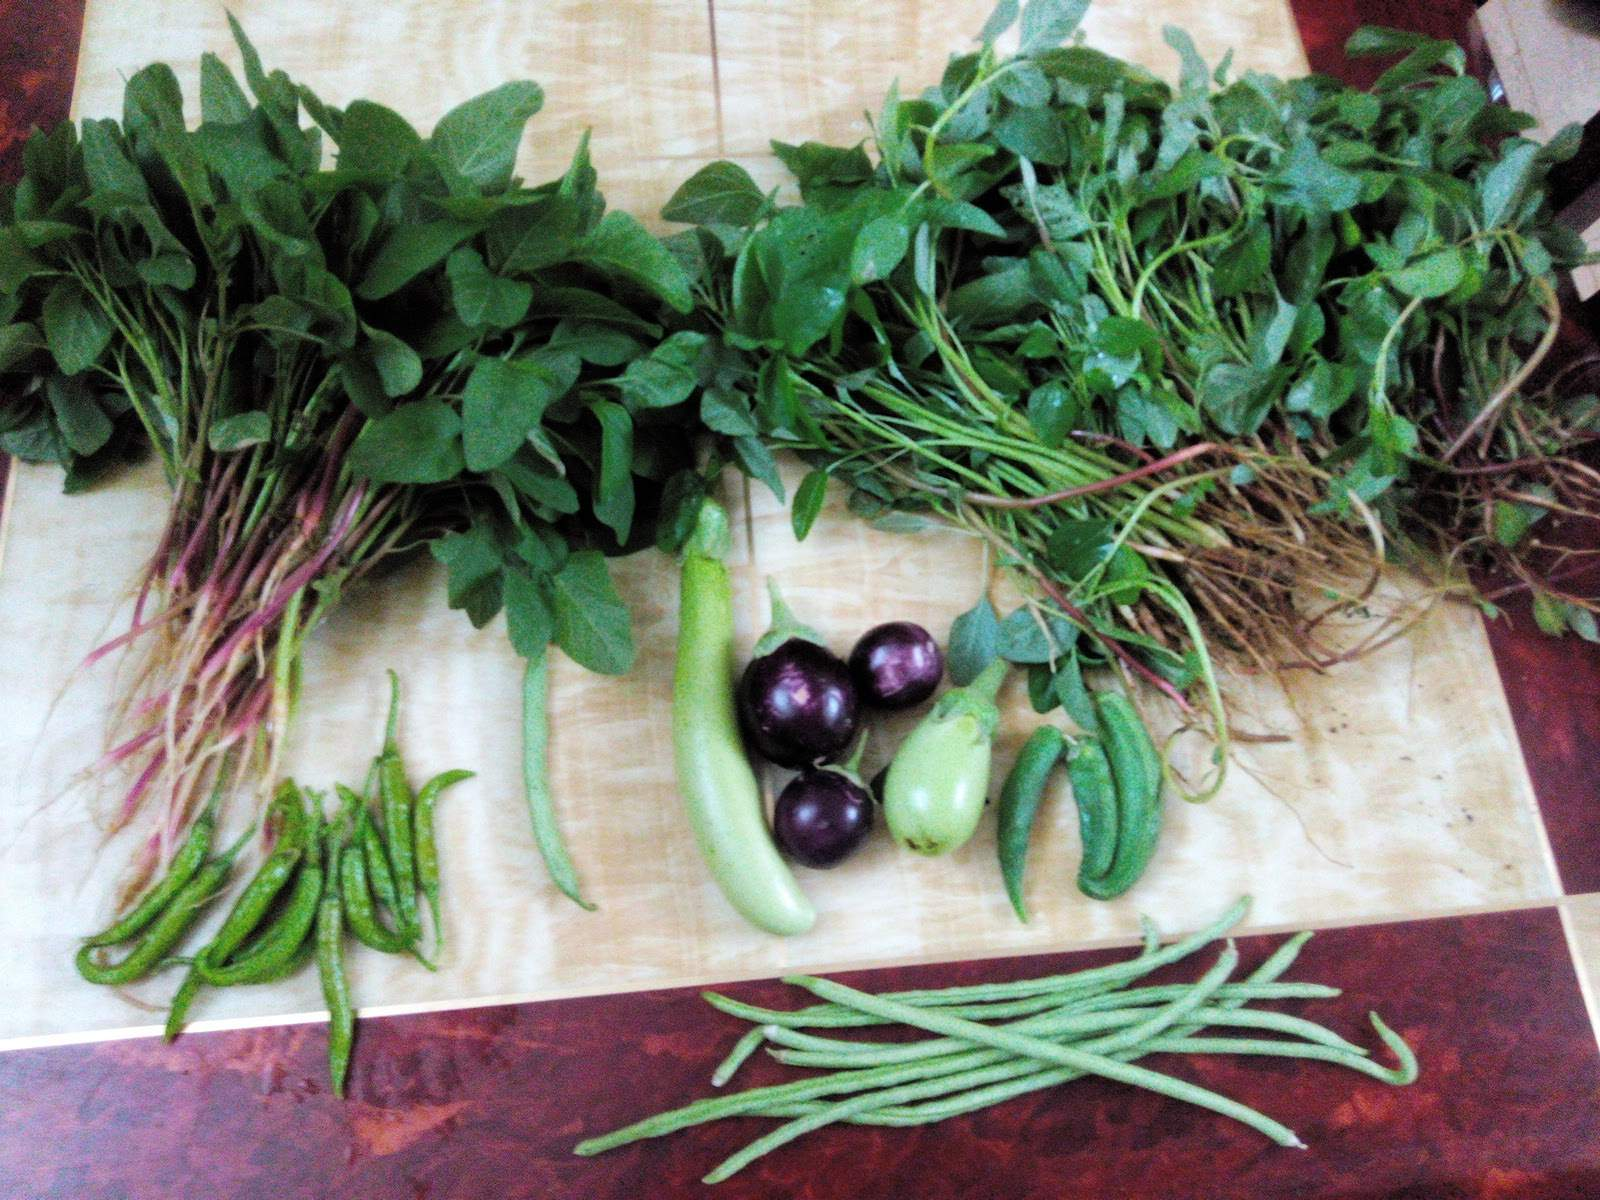 Top 50 department of horticulture in thiruvanmiyur chennai justdial department of horticulture in thiruvanmiyur chennai solutioingenieria Choice Image